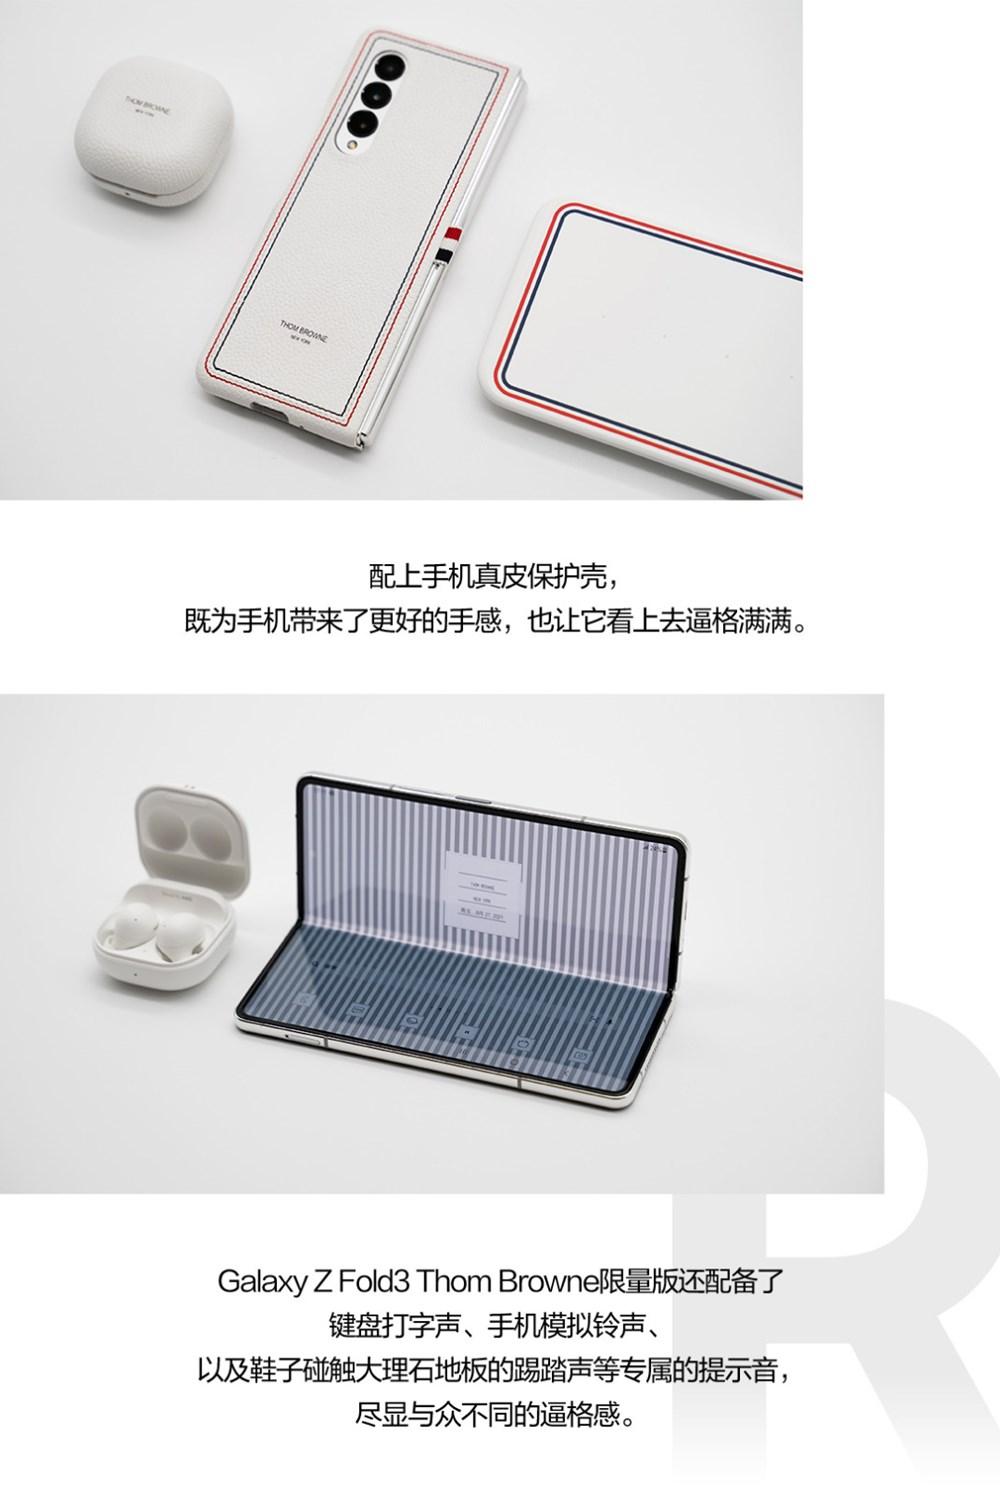 Galaxy Z Fold3 Thom Browne限量版精美图赏